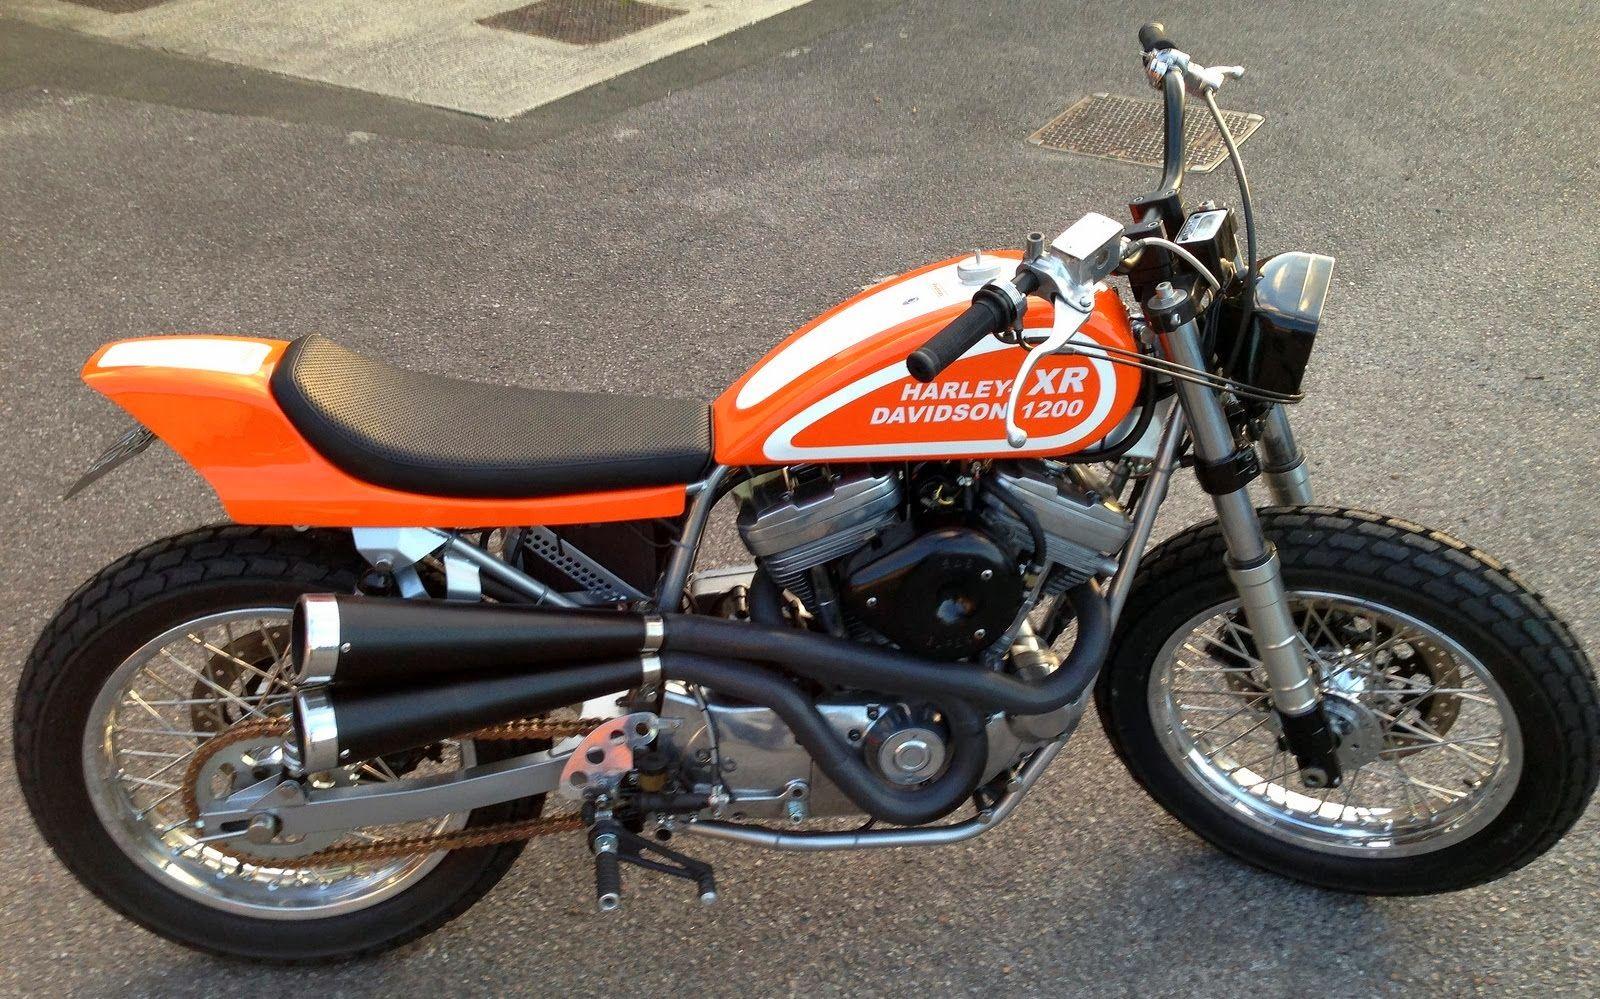 Harley-Davidson XR1200 tracker